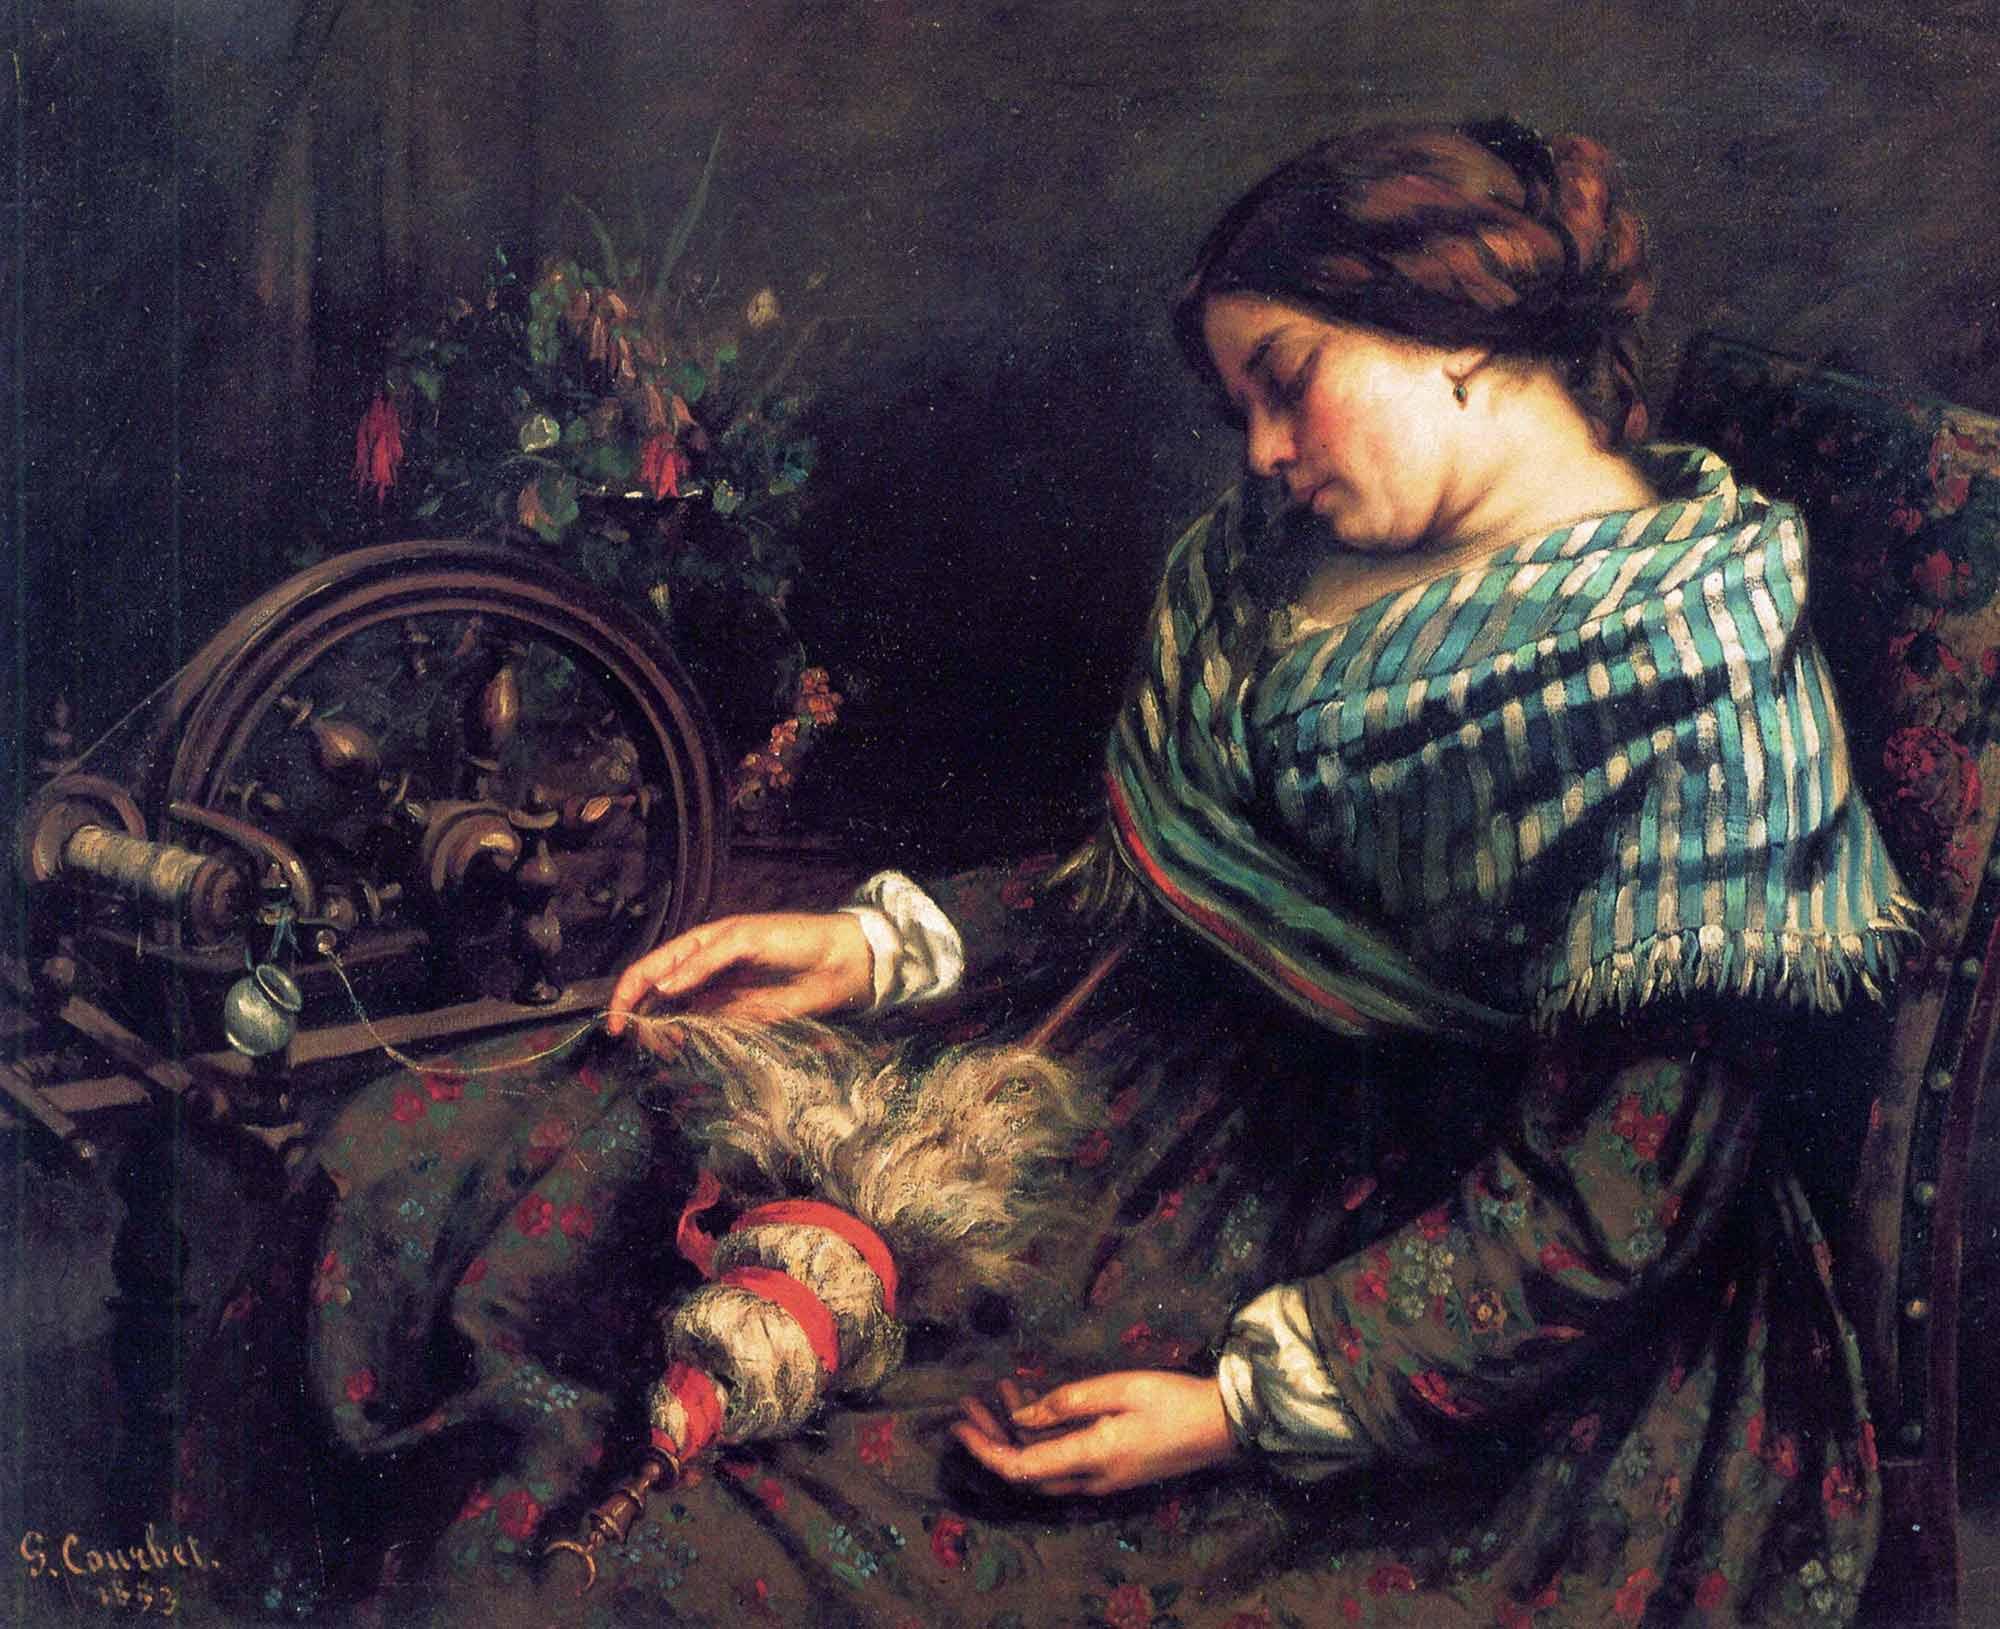 Gustave Courbet Uyuyan Örgücü